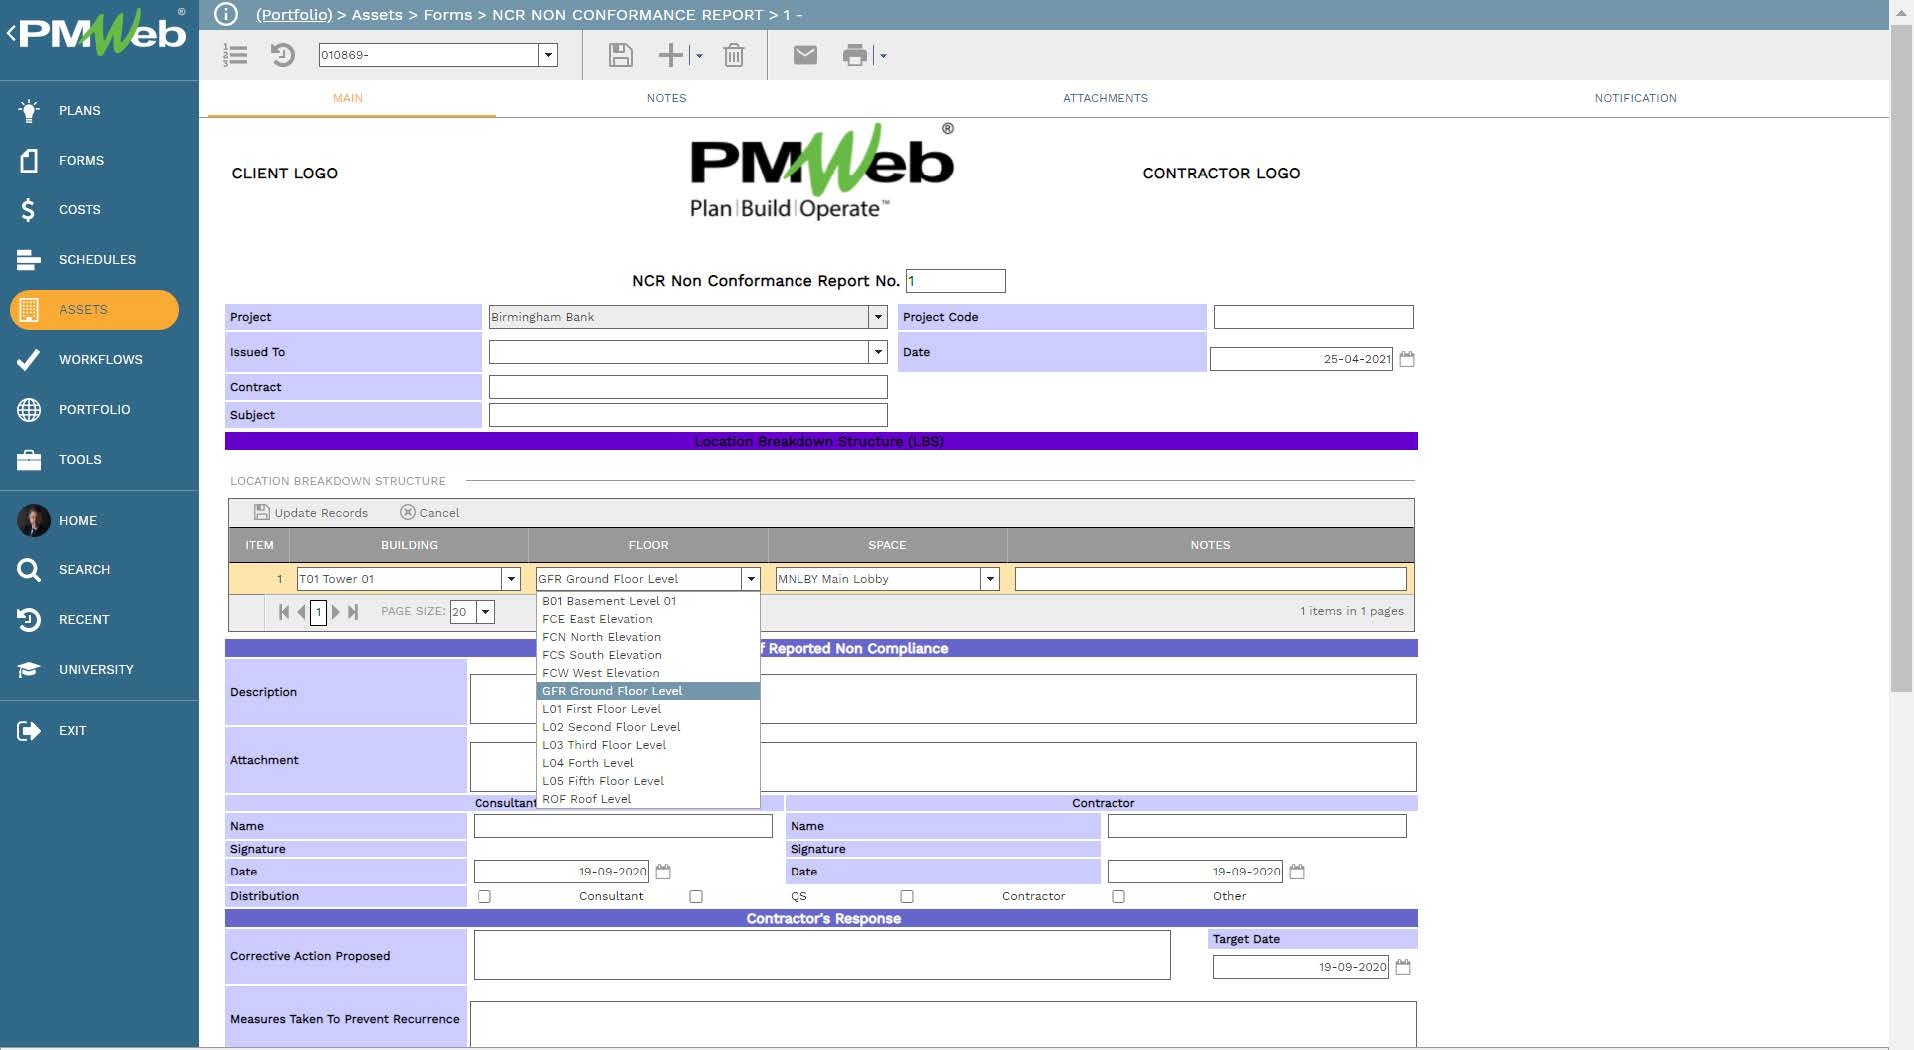 PMWeb 7 Assets Forms NCR Non Conformance Report